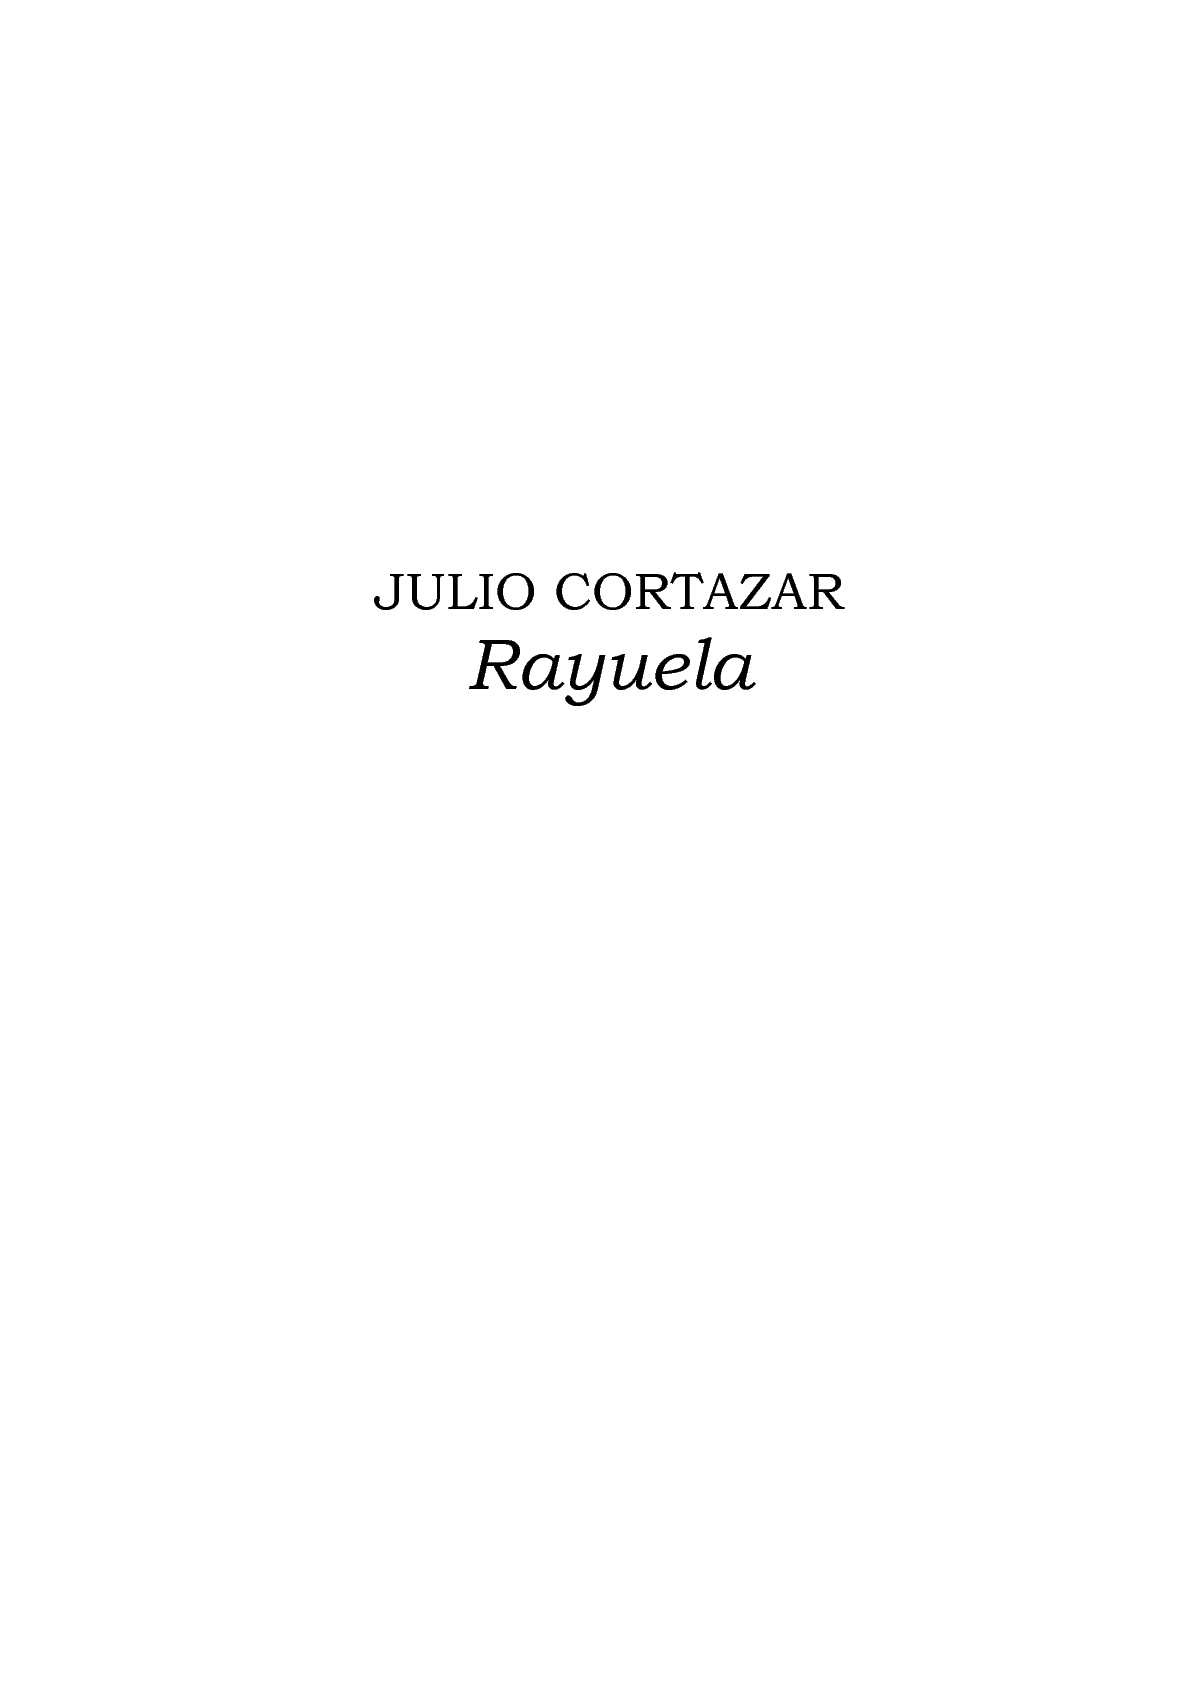 Calaméo - Cortázar, Julio - Rayuela